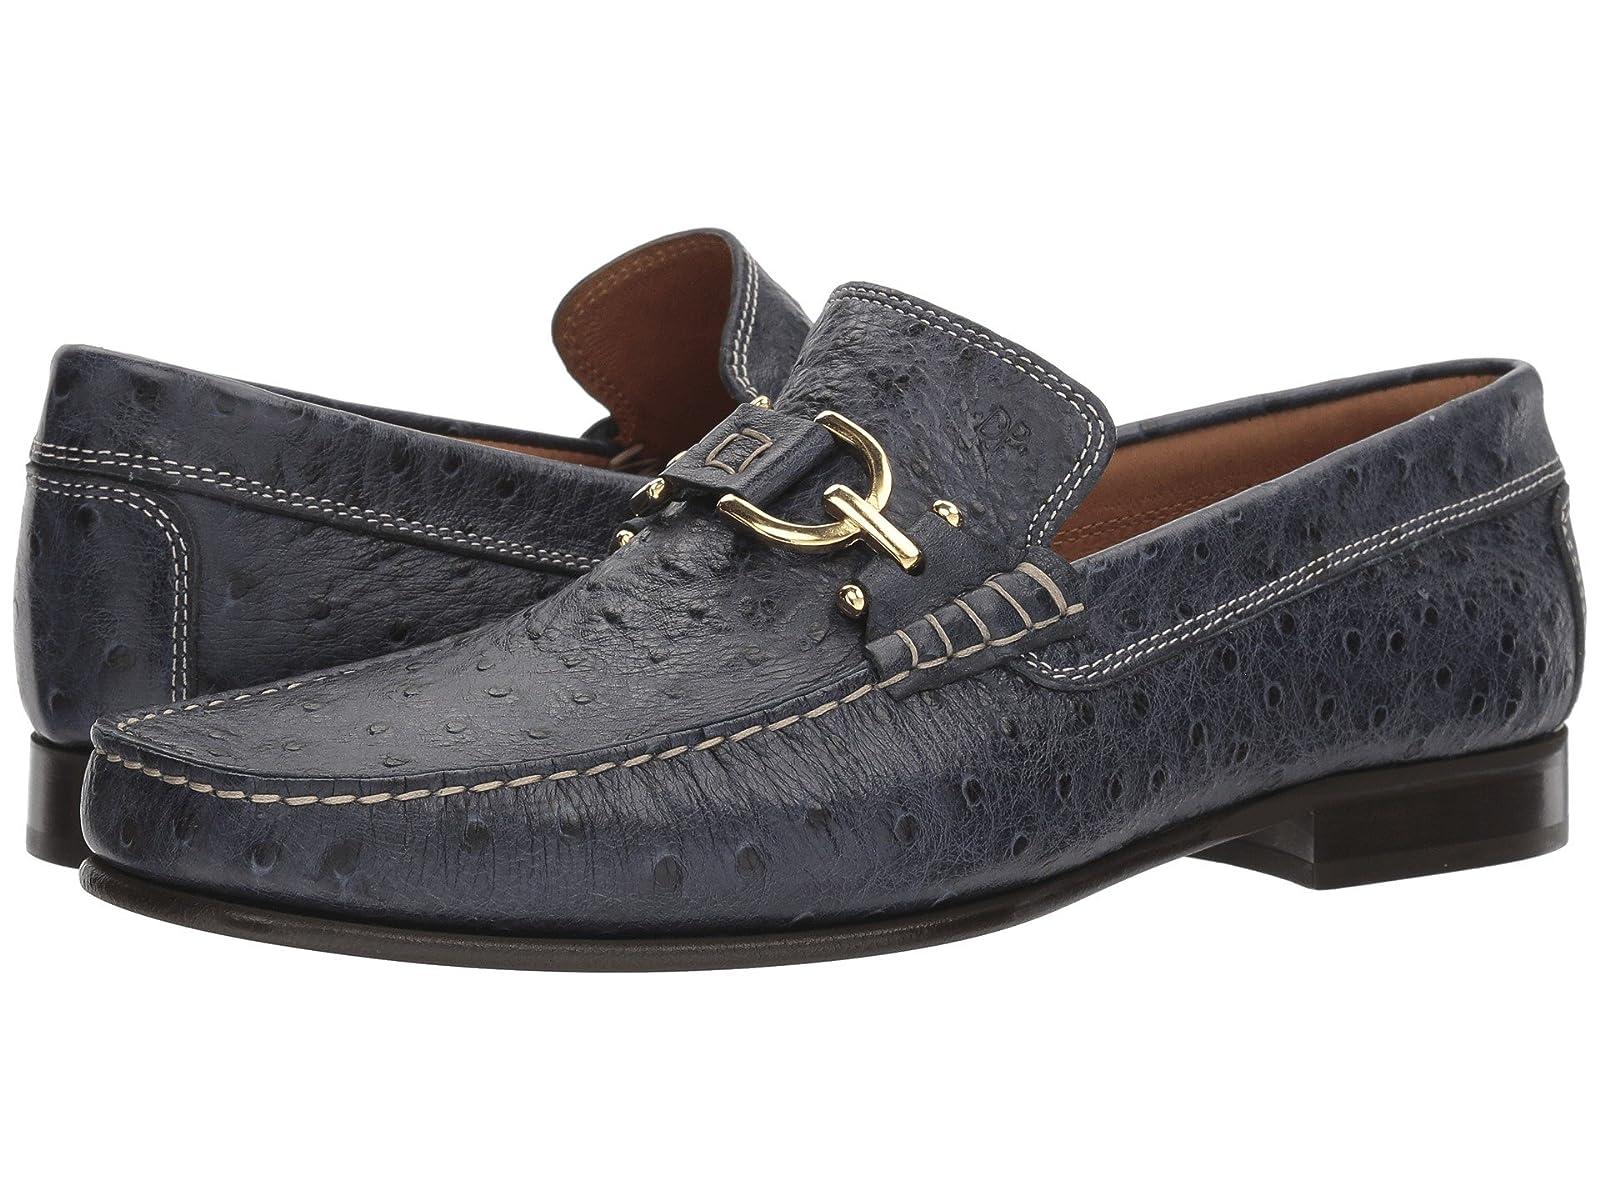 Donald J Pliner DacioAtmospheric grades have affordable shoes